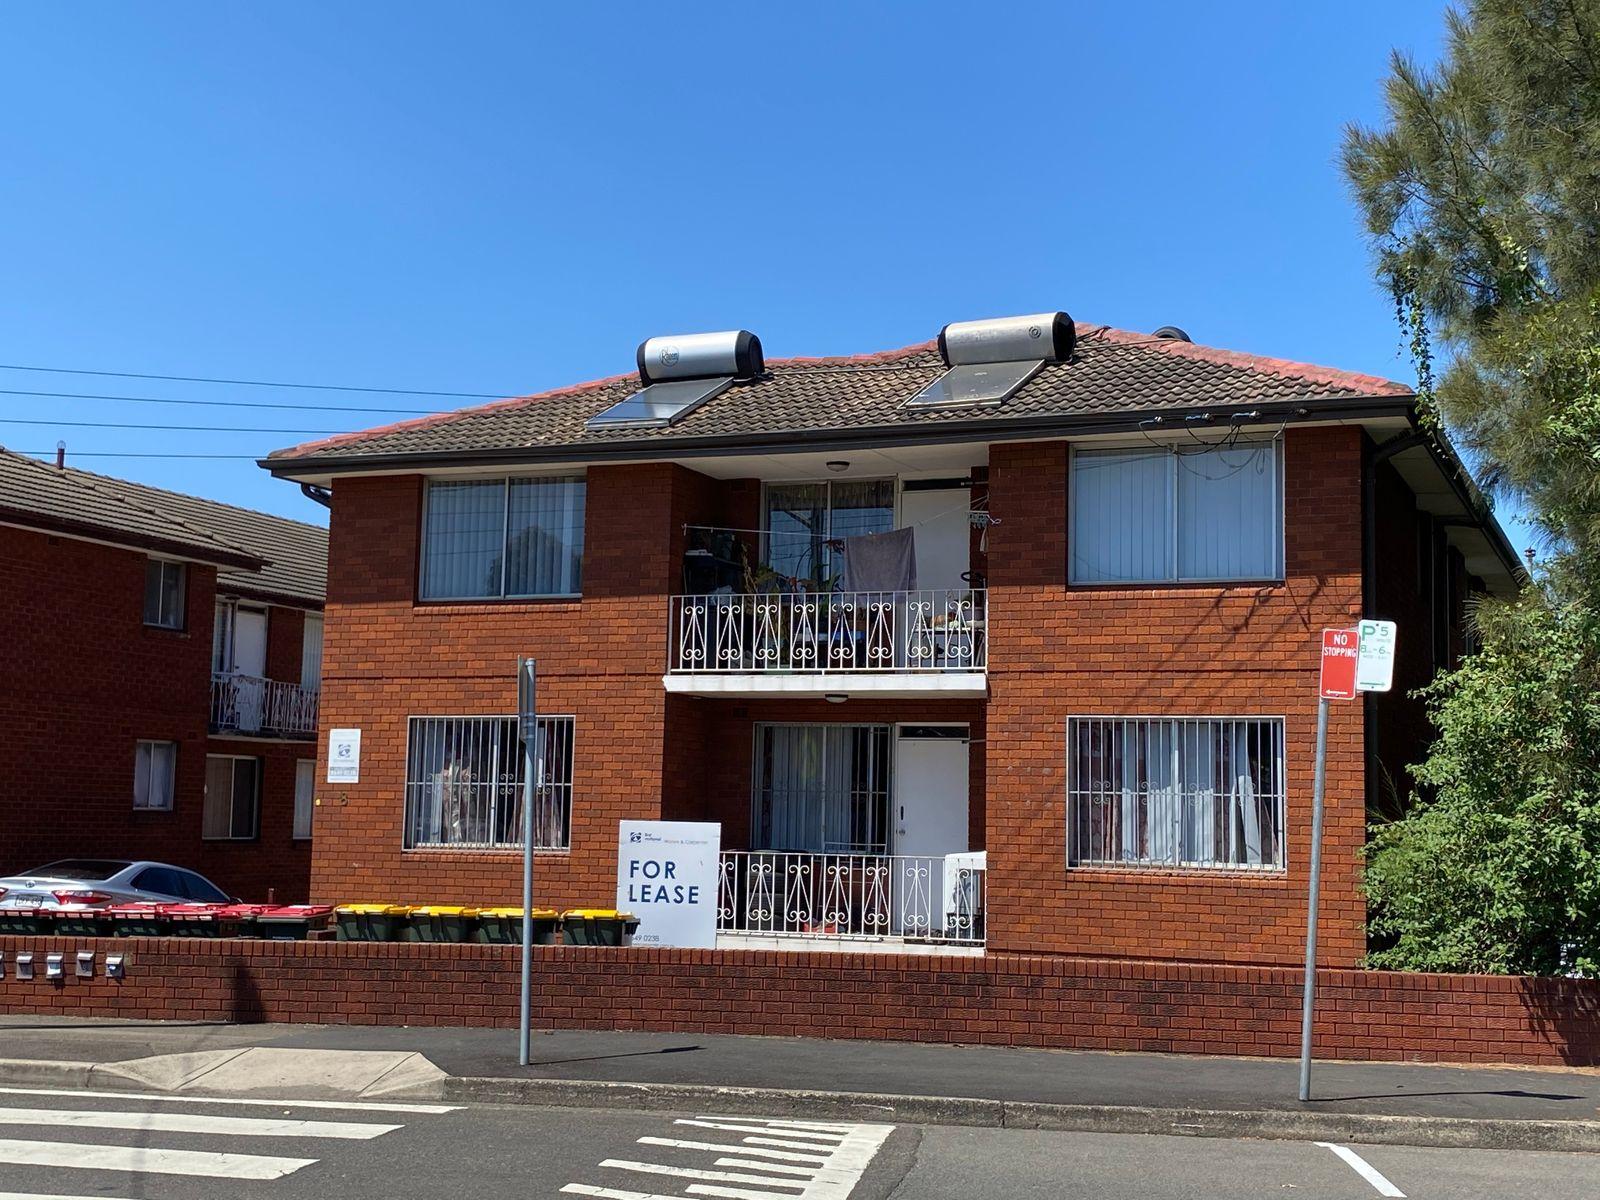 8/8 Cambridge Street, Harris Park, NSW 2150